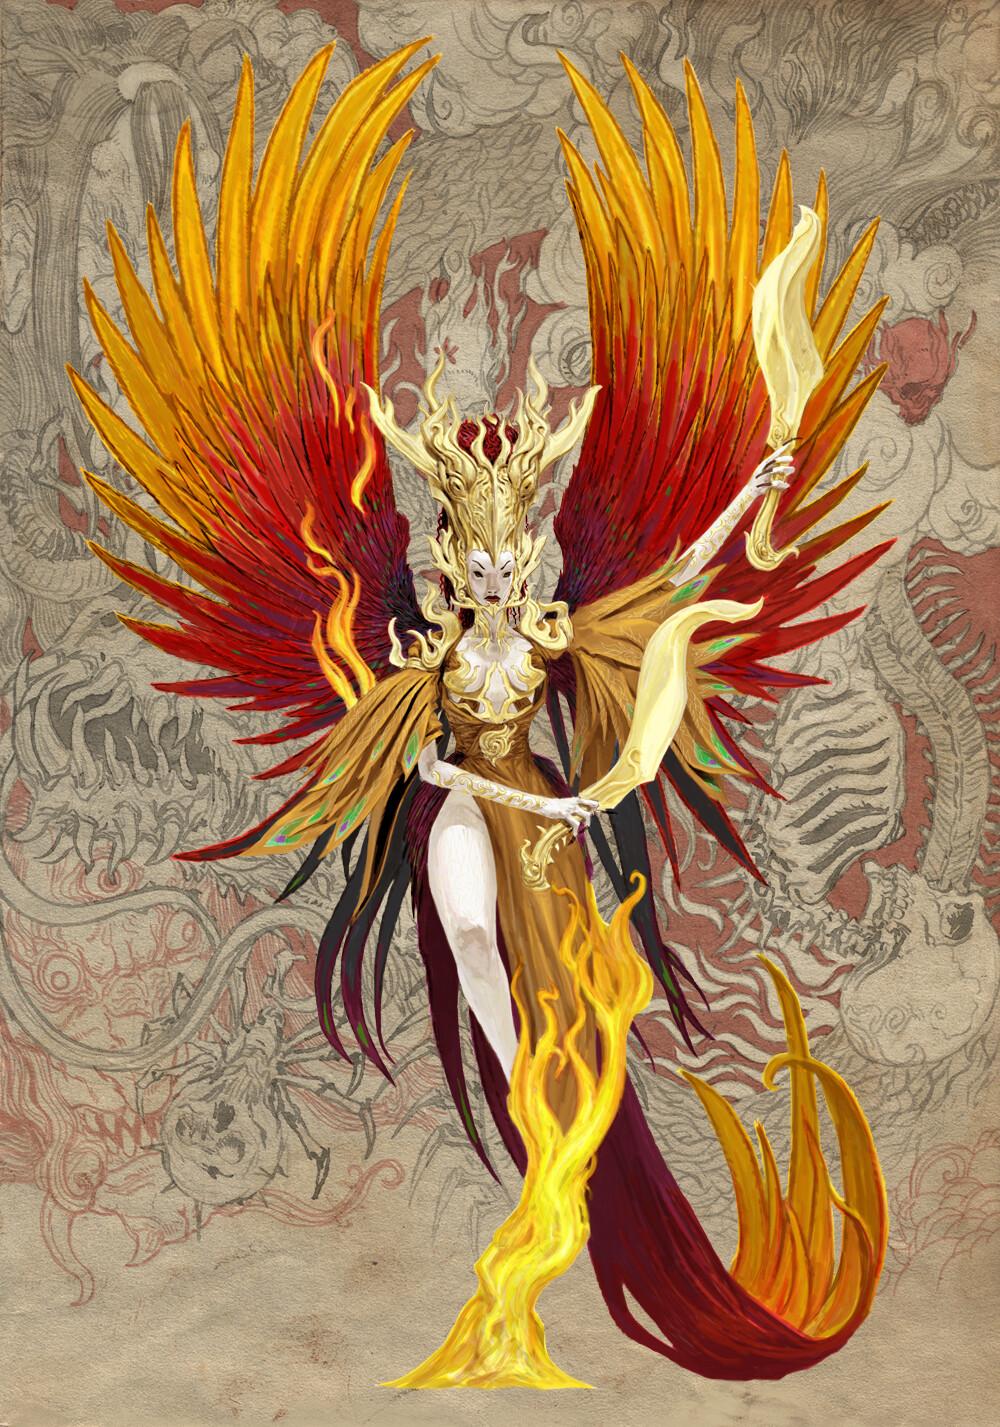 Adrian smith monster demon spirit kami phoenix